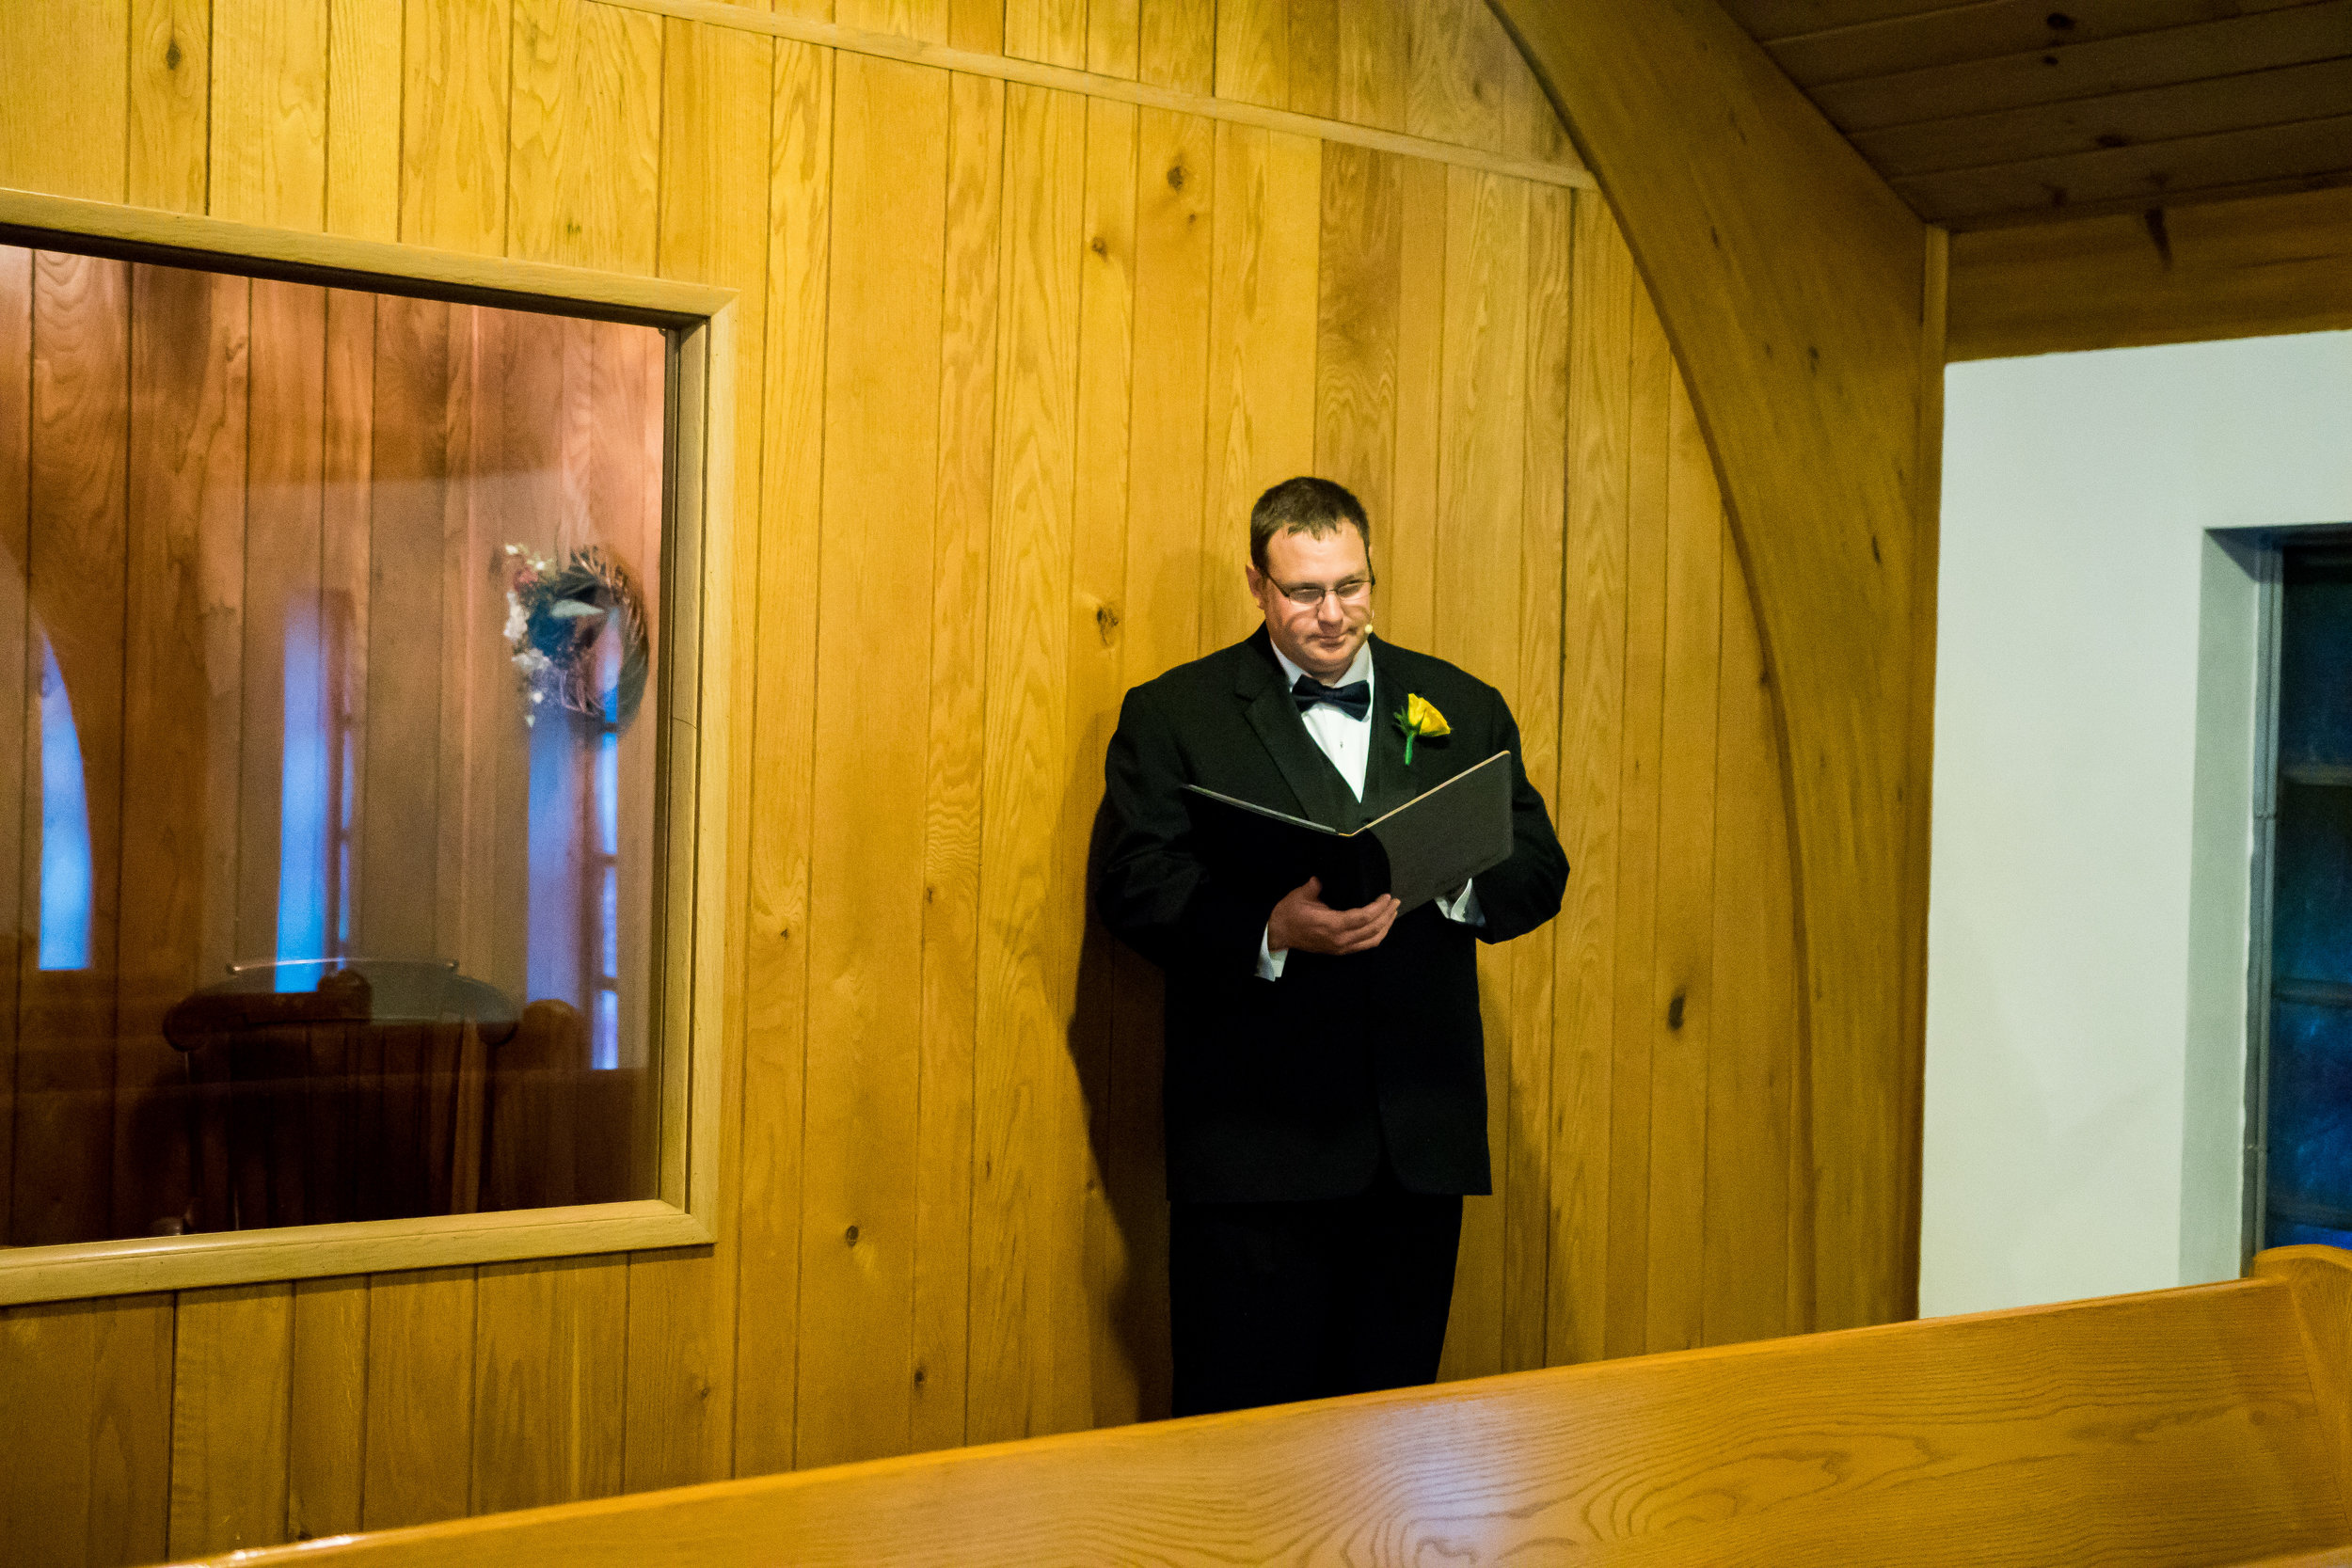 Wedding_Photography_Ward-617.jpg